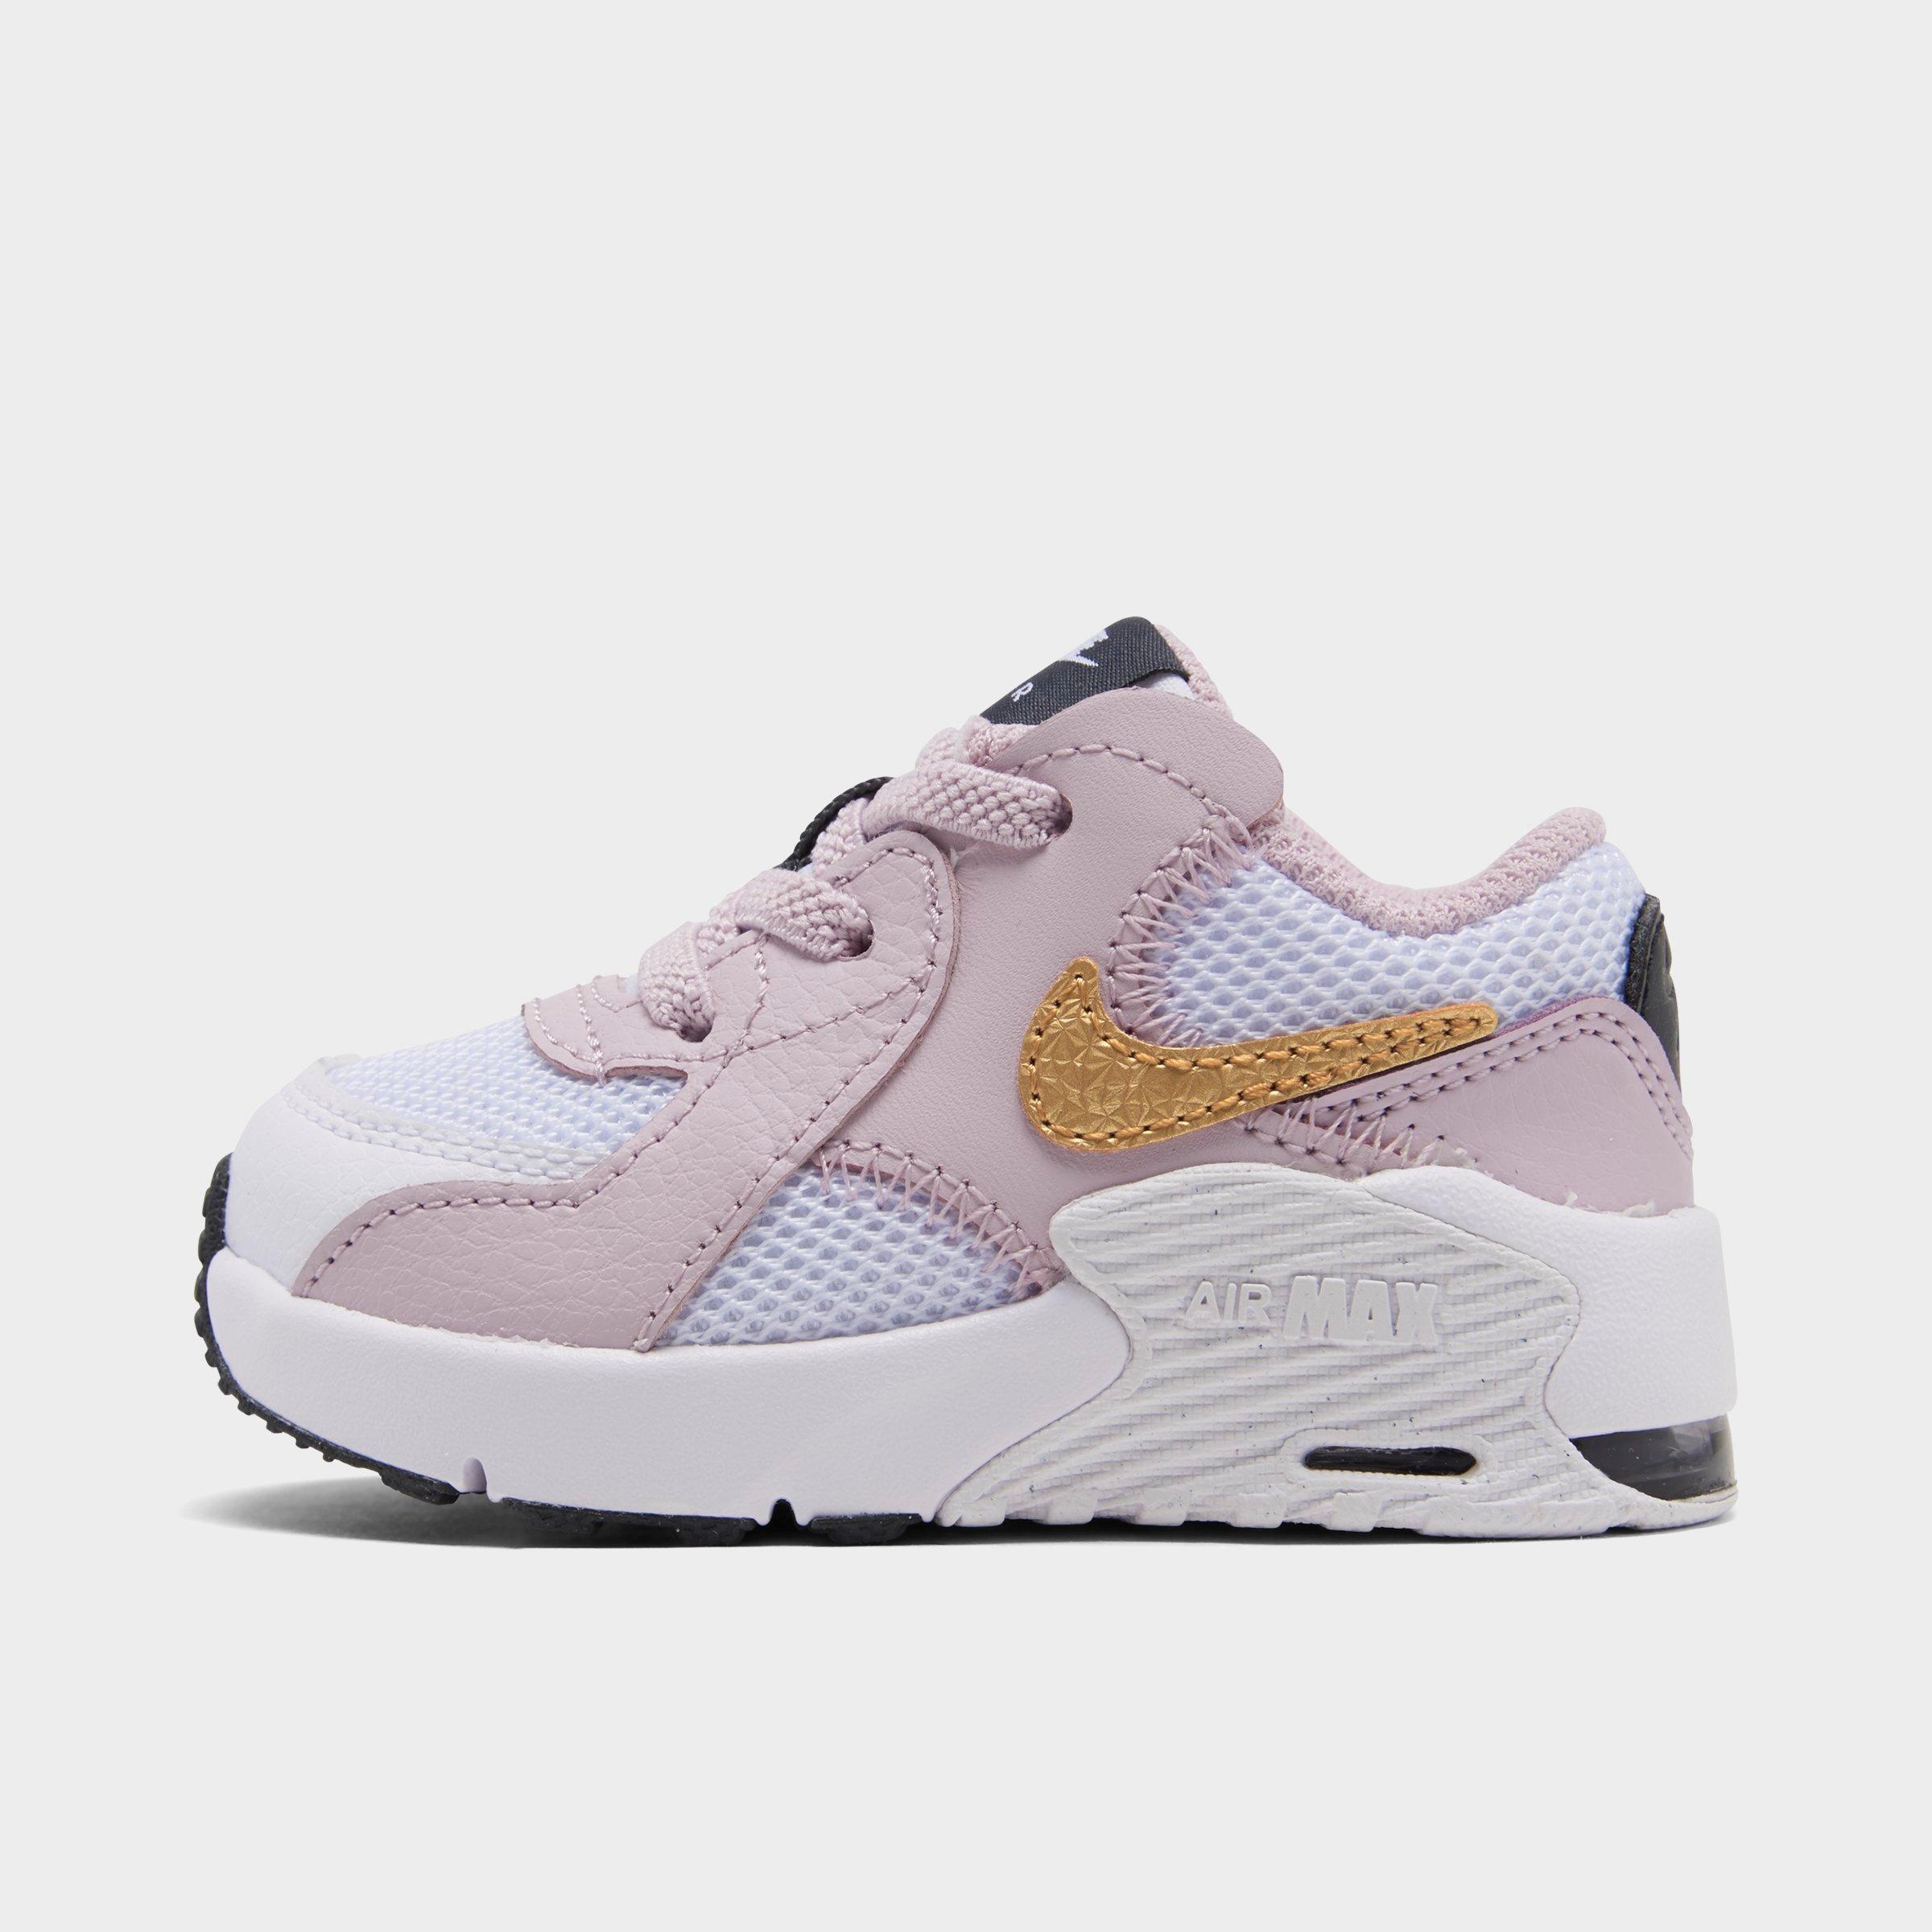 toddler nike air max shoes